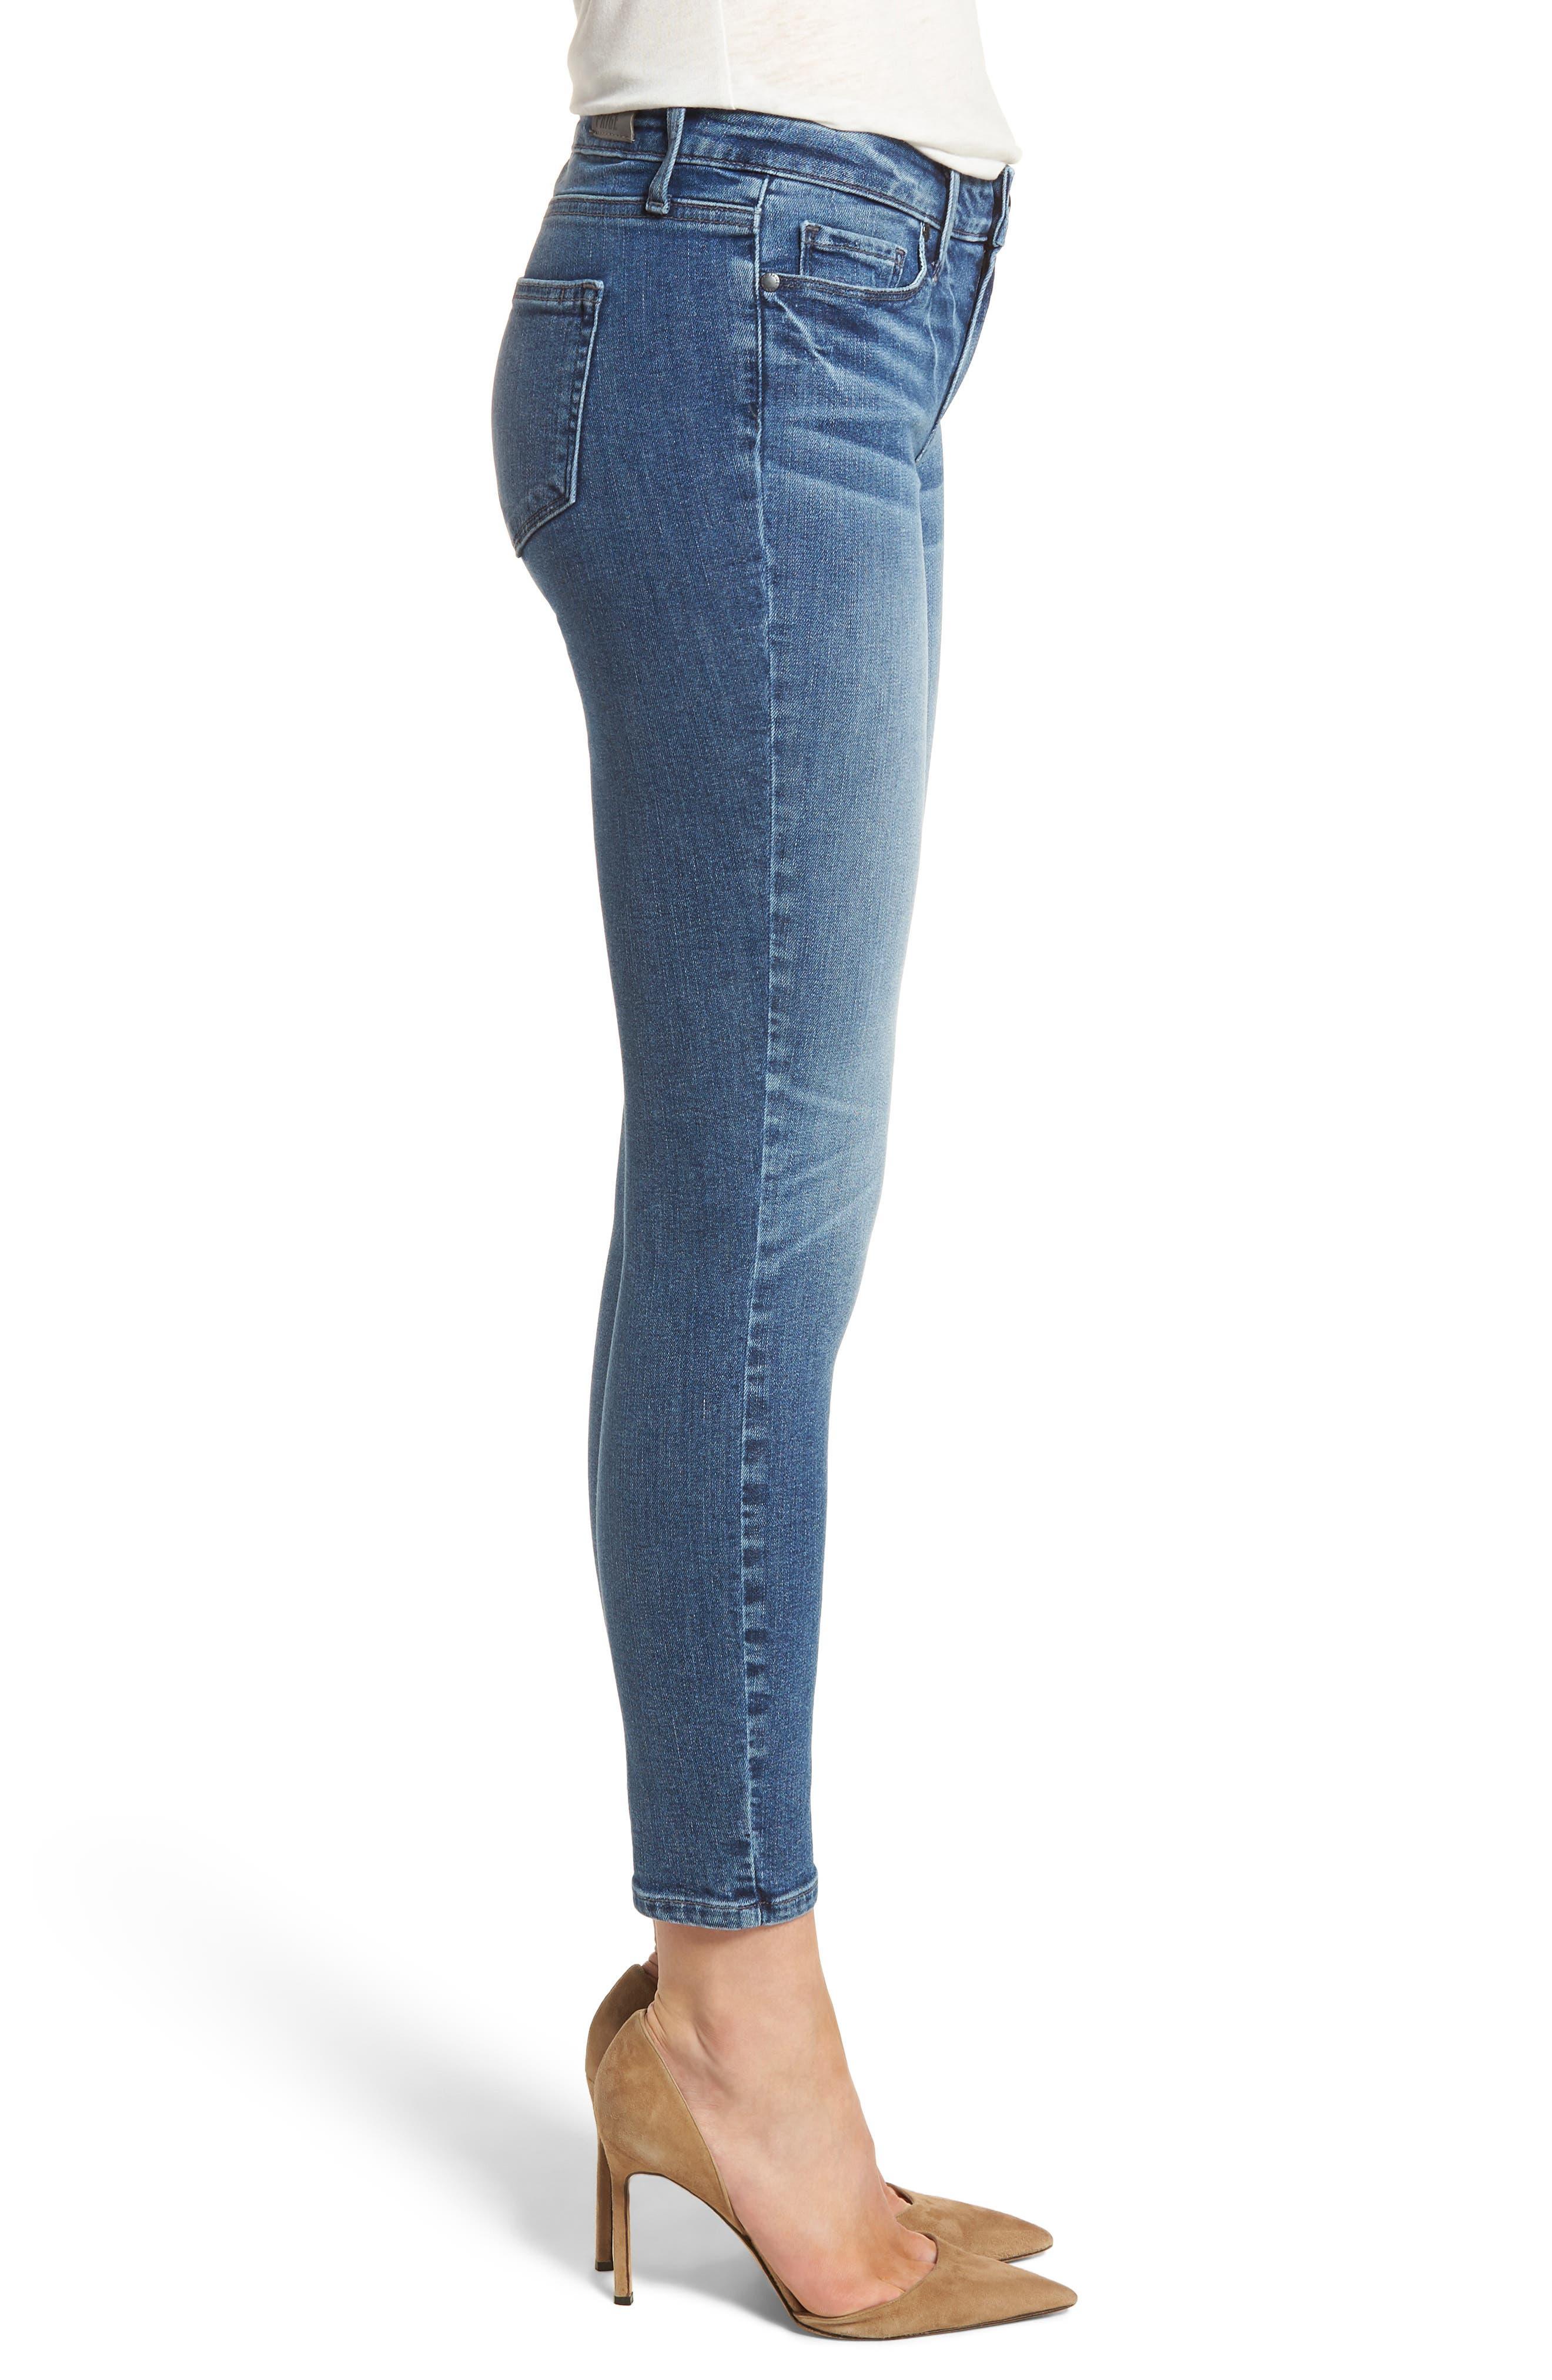 Transcend Vintage - Verdugo Crop Ultra Skinny Jeans,                             Alternate thumbnail 3, color,                             Bloomfield